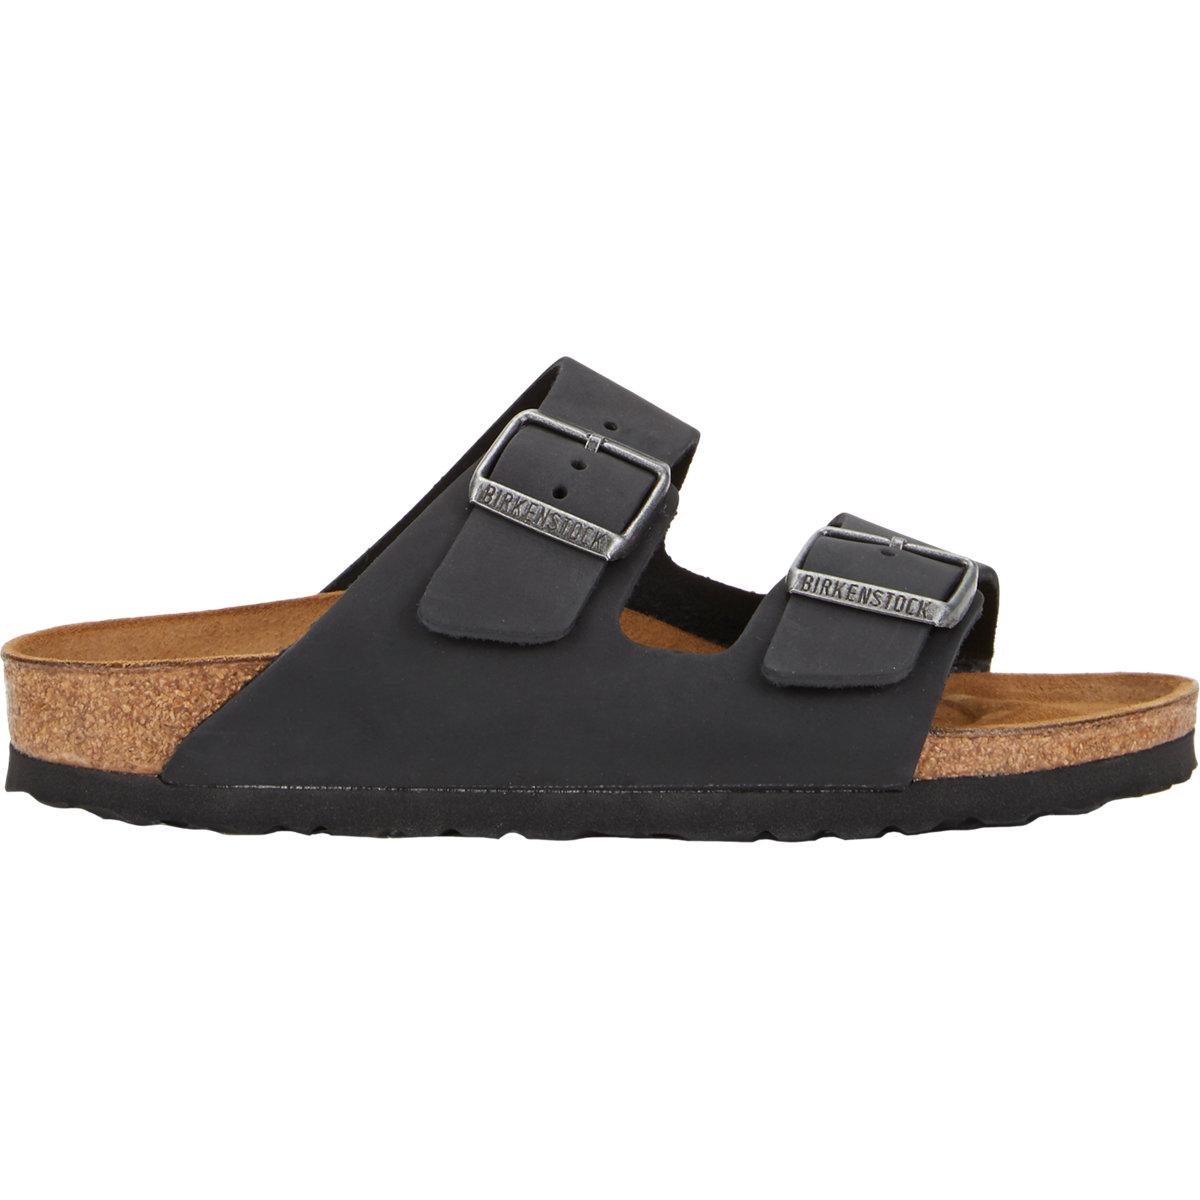 Birkenstock Arizona Sandals at Barneys.com